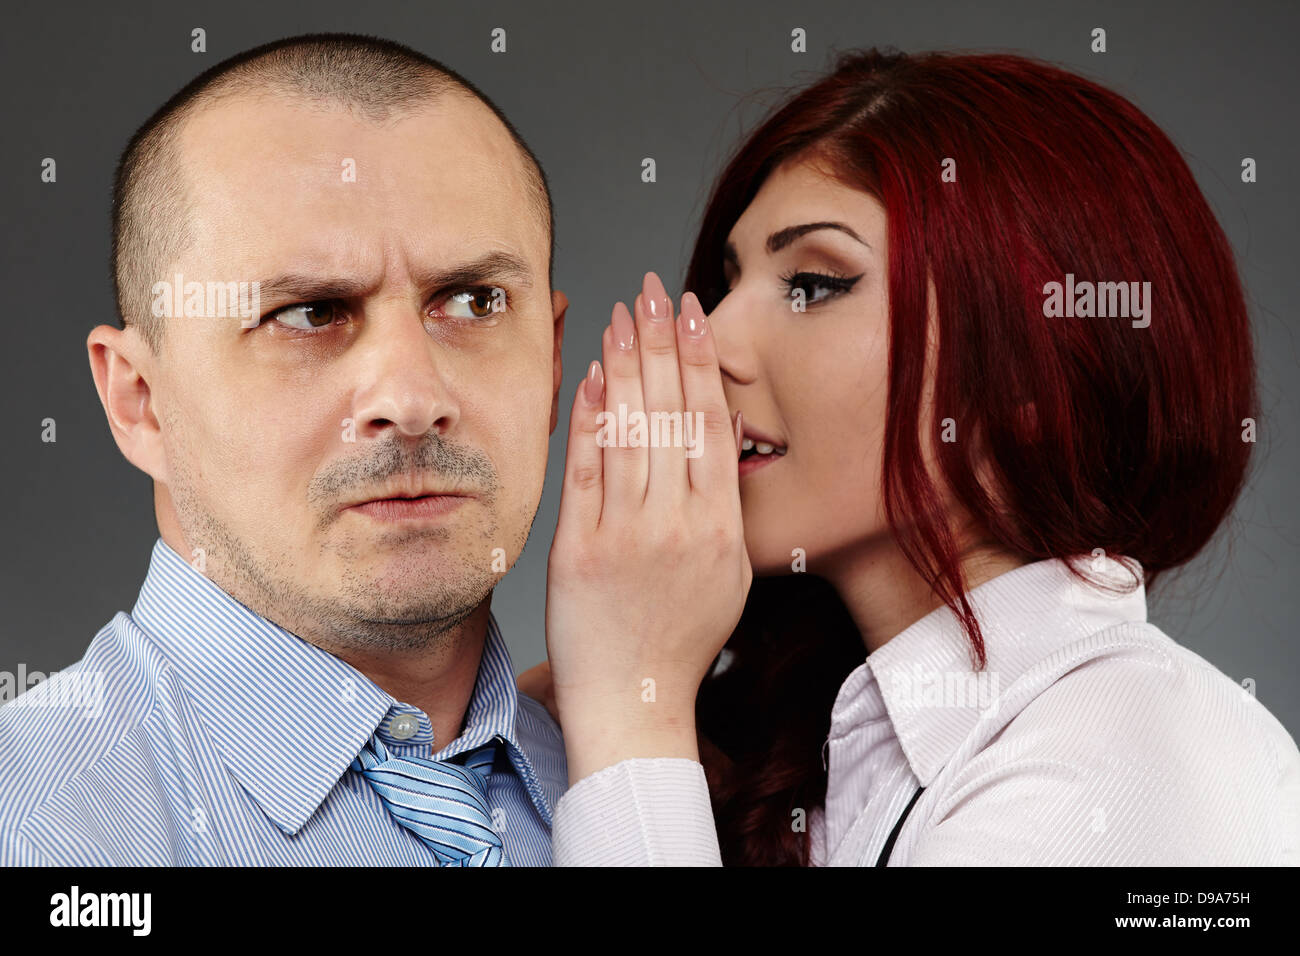 Secretary sharing some secrets to her boss, studio shot - Stock Image